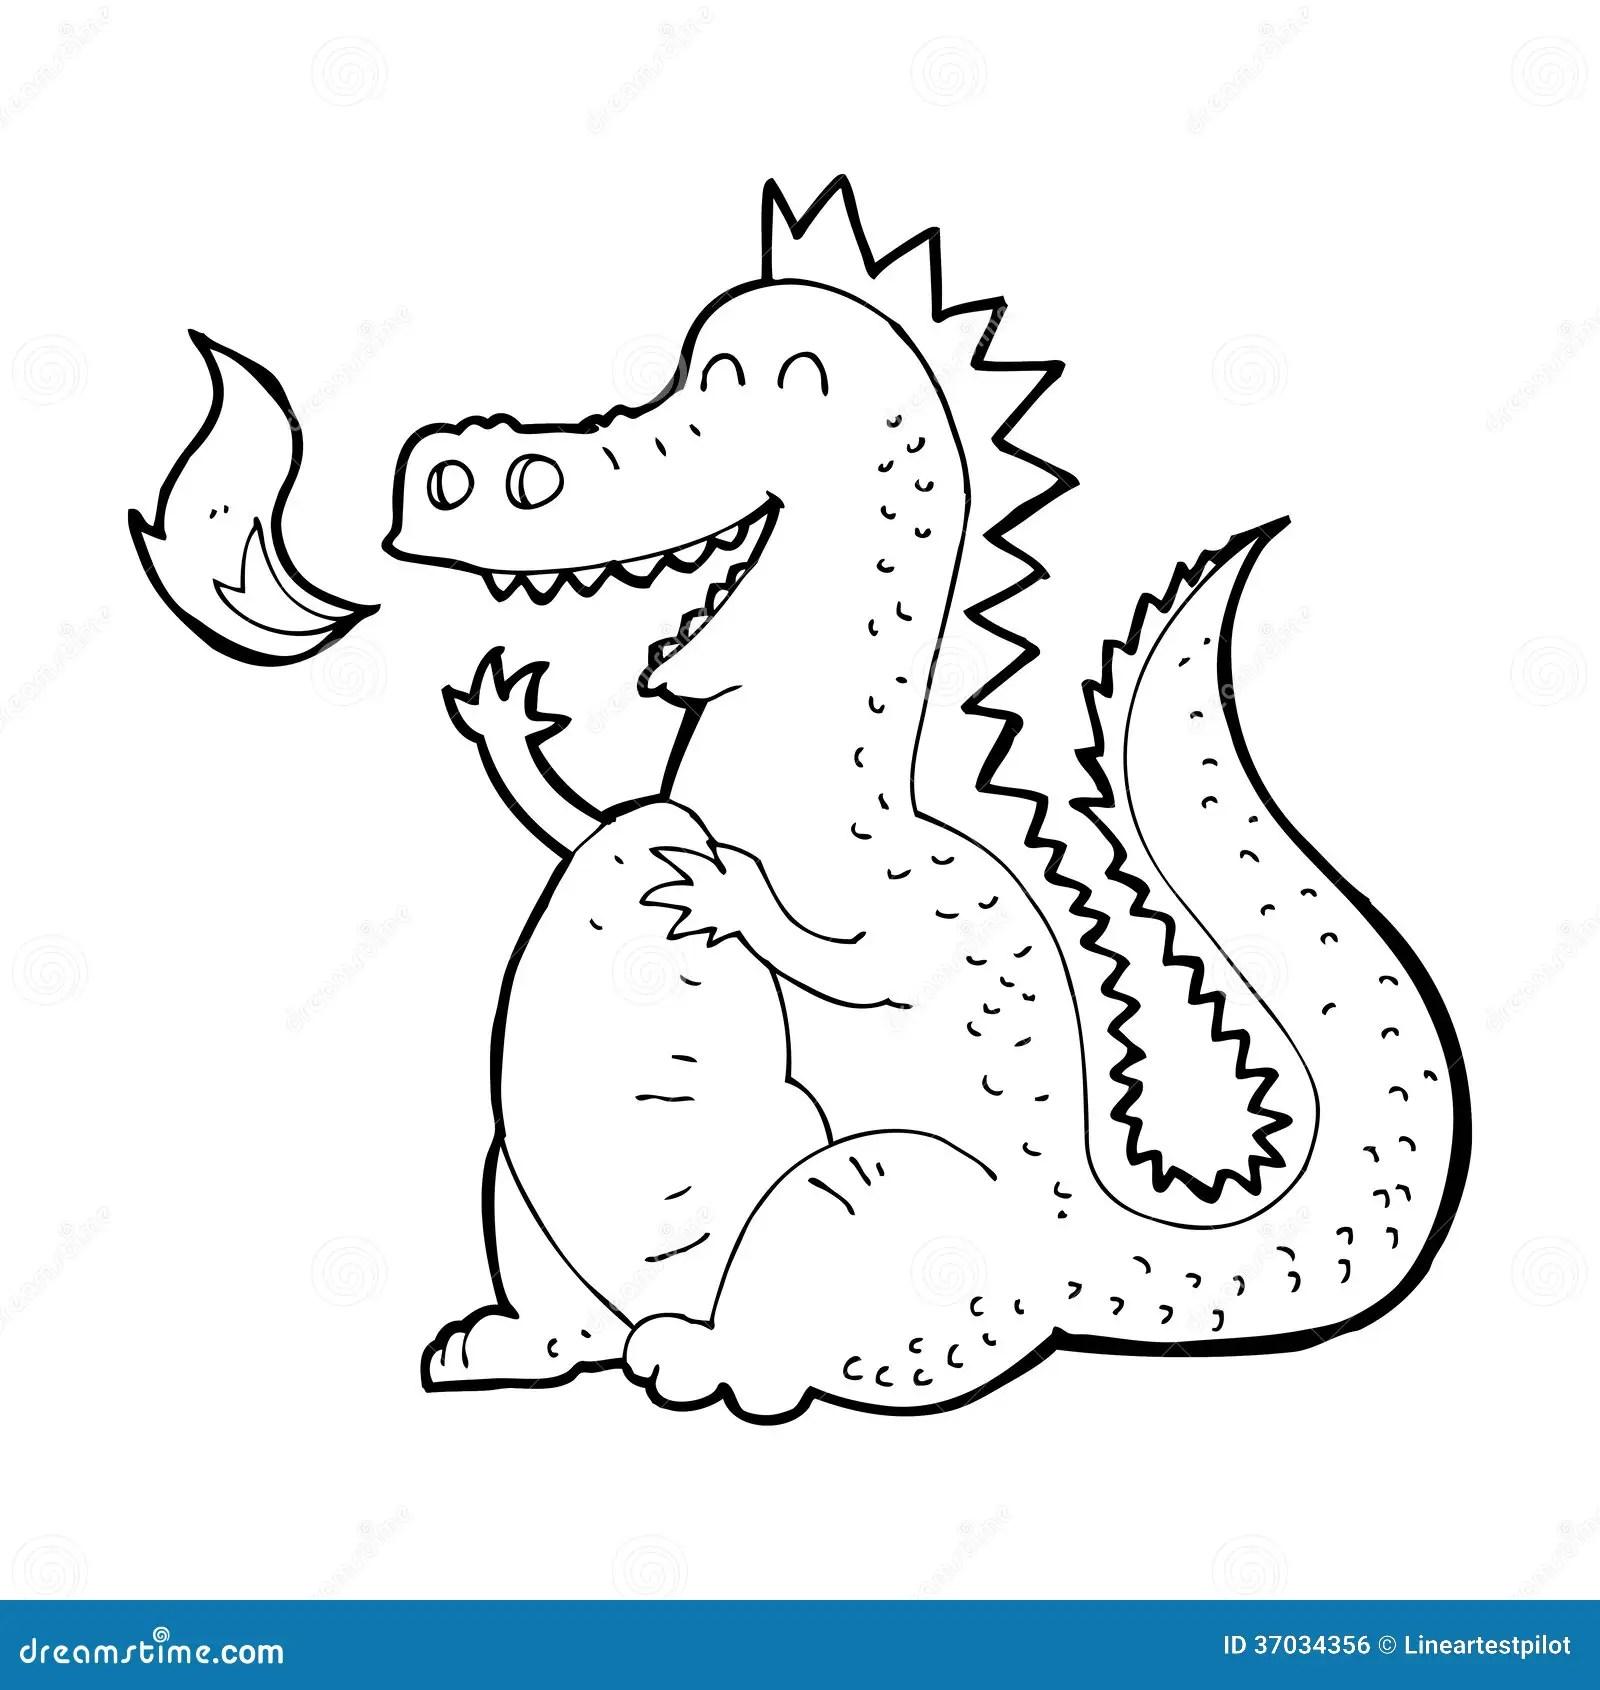 Cartoon Fire Breathing Dragon Royalty Free Stock Image